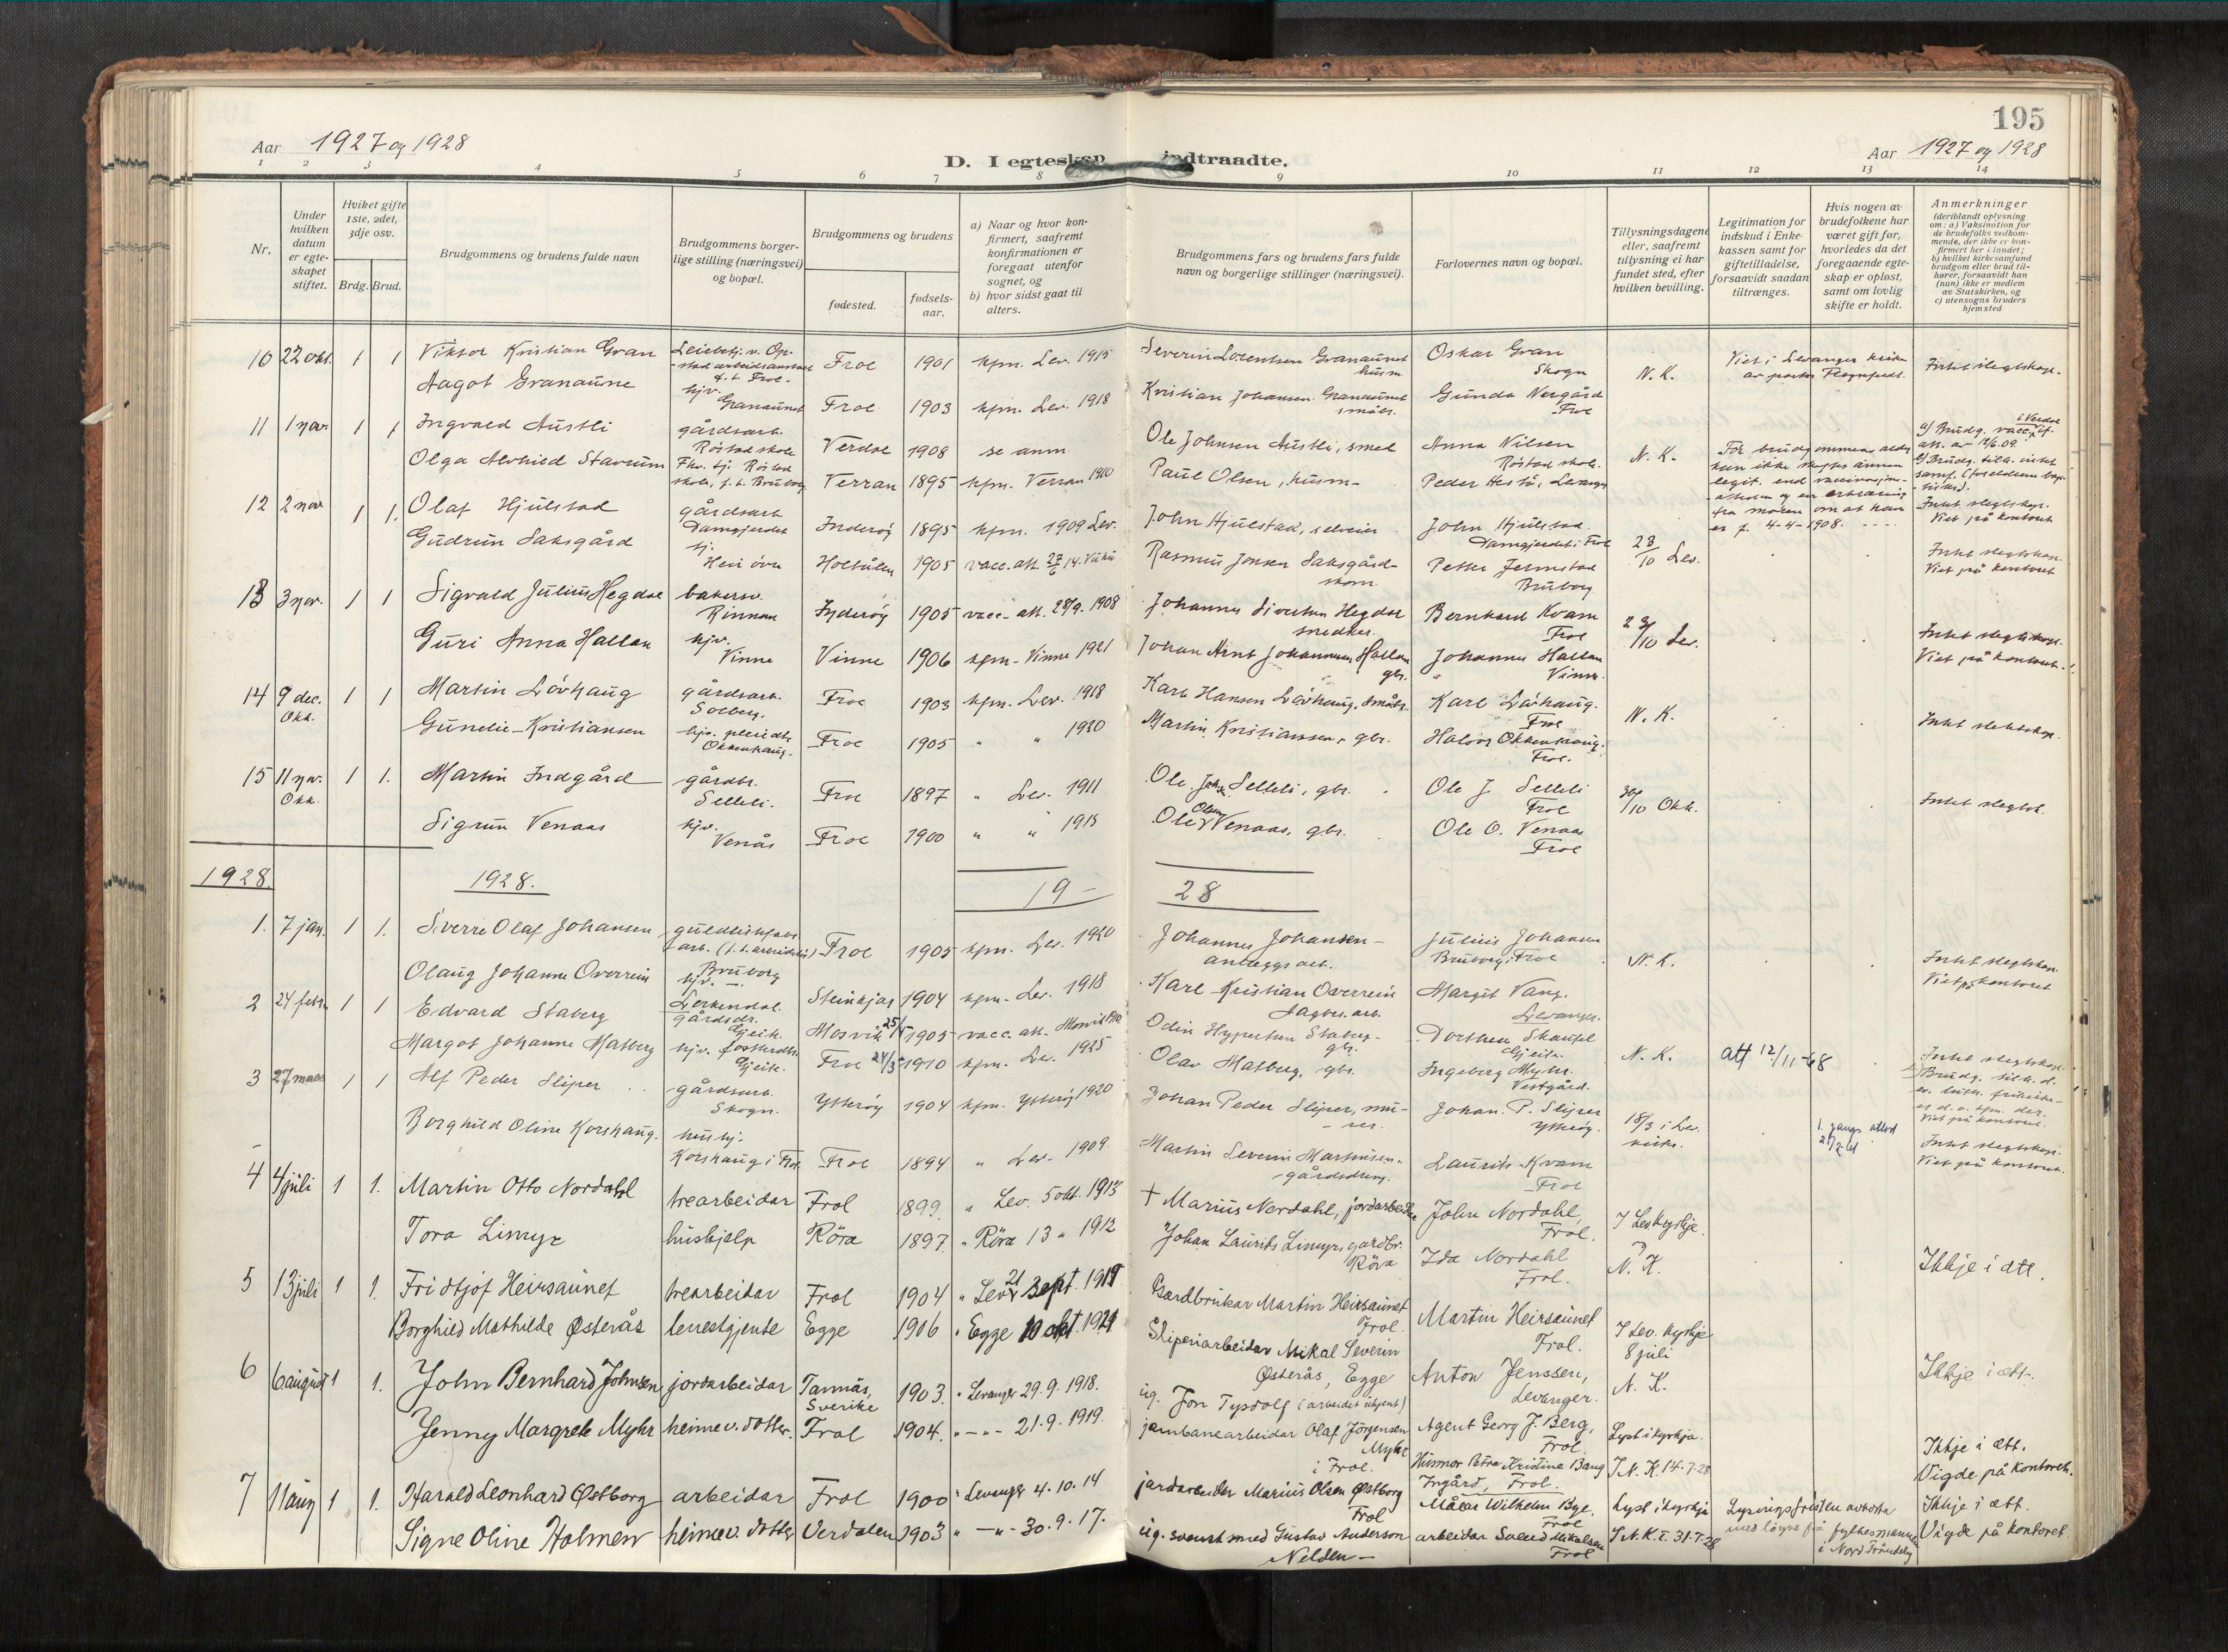 SAT, Levanger sokneprestkontor*, Parish register (official) no. 1, 1912-1935, p. 195